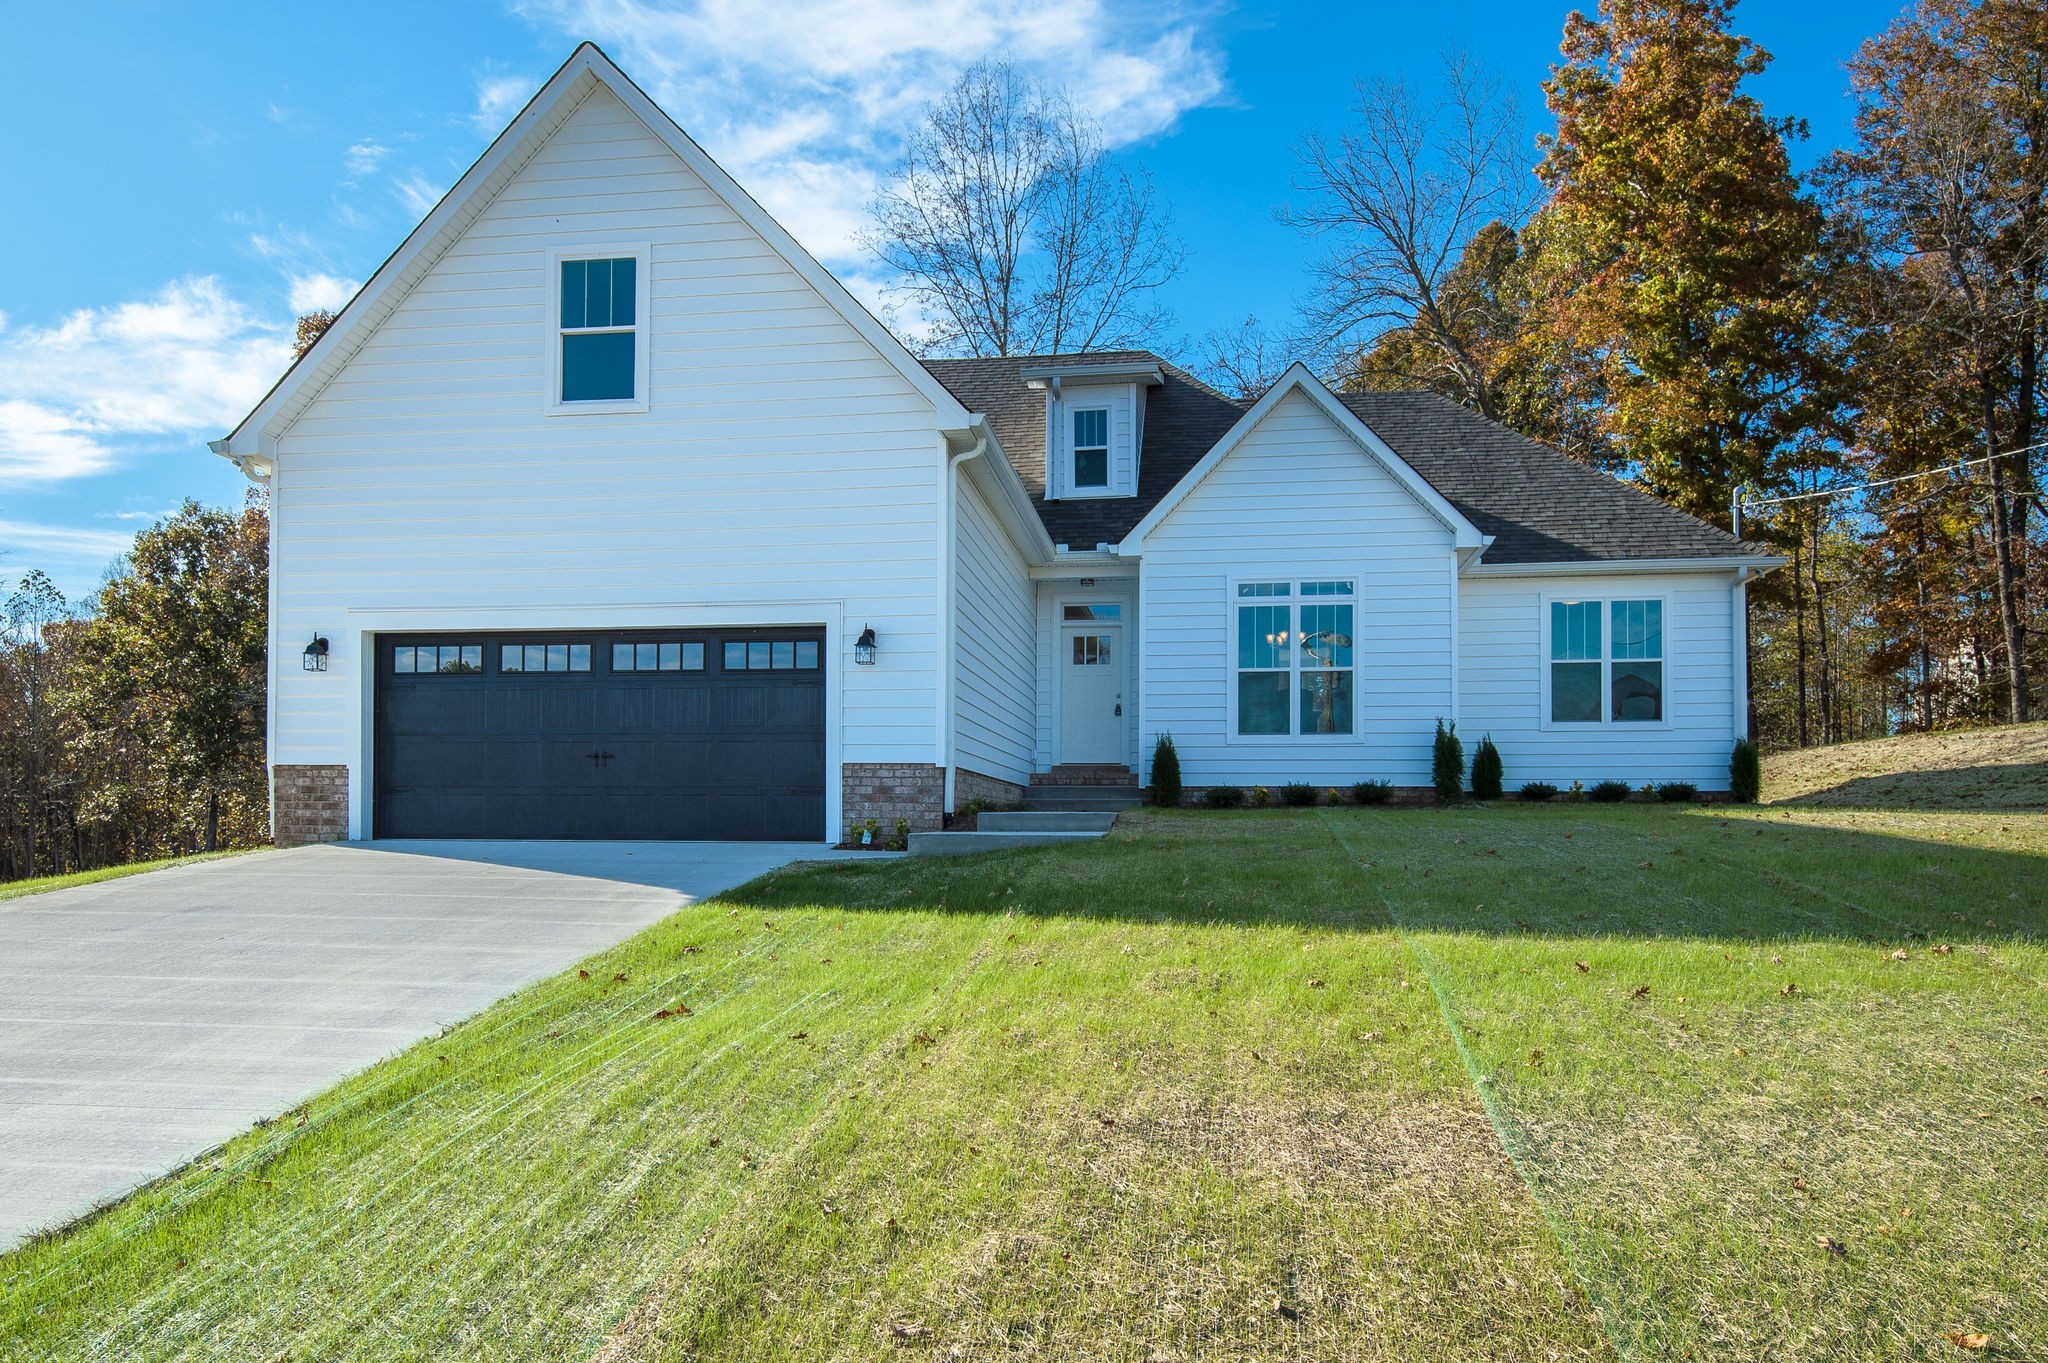 117 Laken Lane Lot 374, Dickson, TN 37055 - Dickson, TN real estate listing